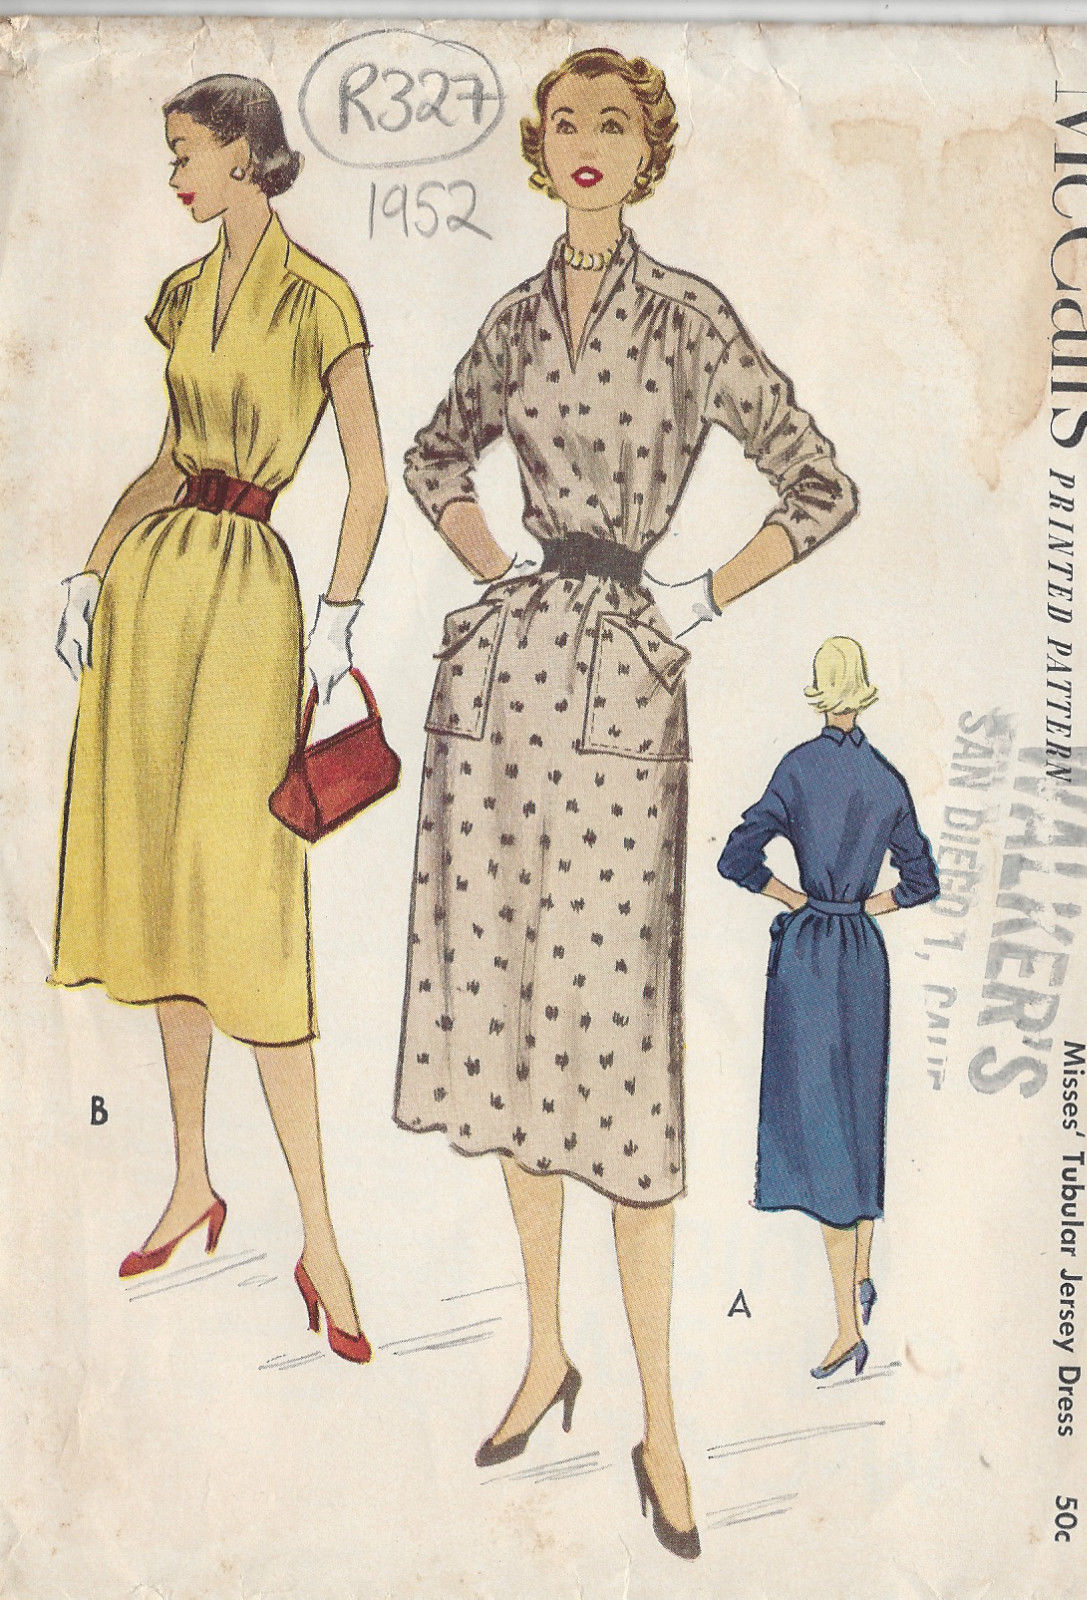 Vintage Sewing Patterns 1952 Vintage Sewing Pattern Dress B38 R327 The Vintage Pattern Shop